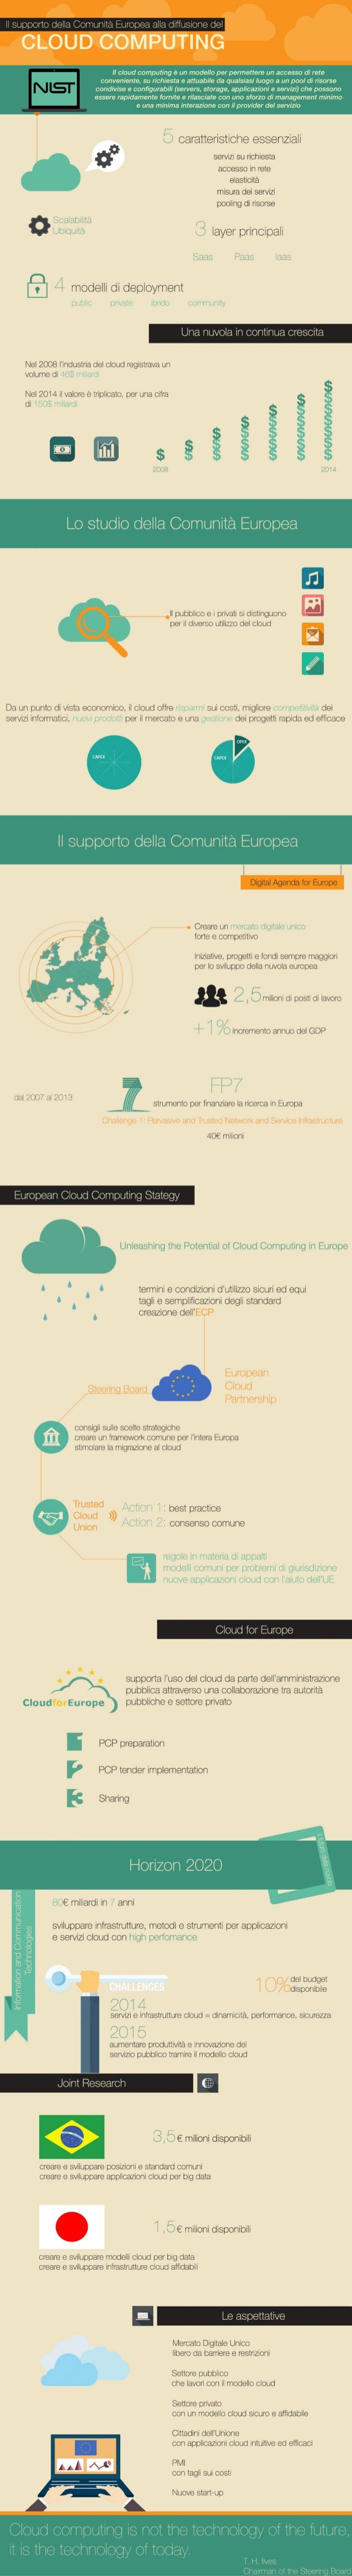 Information Management - EU and Cloud Computing